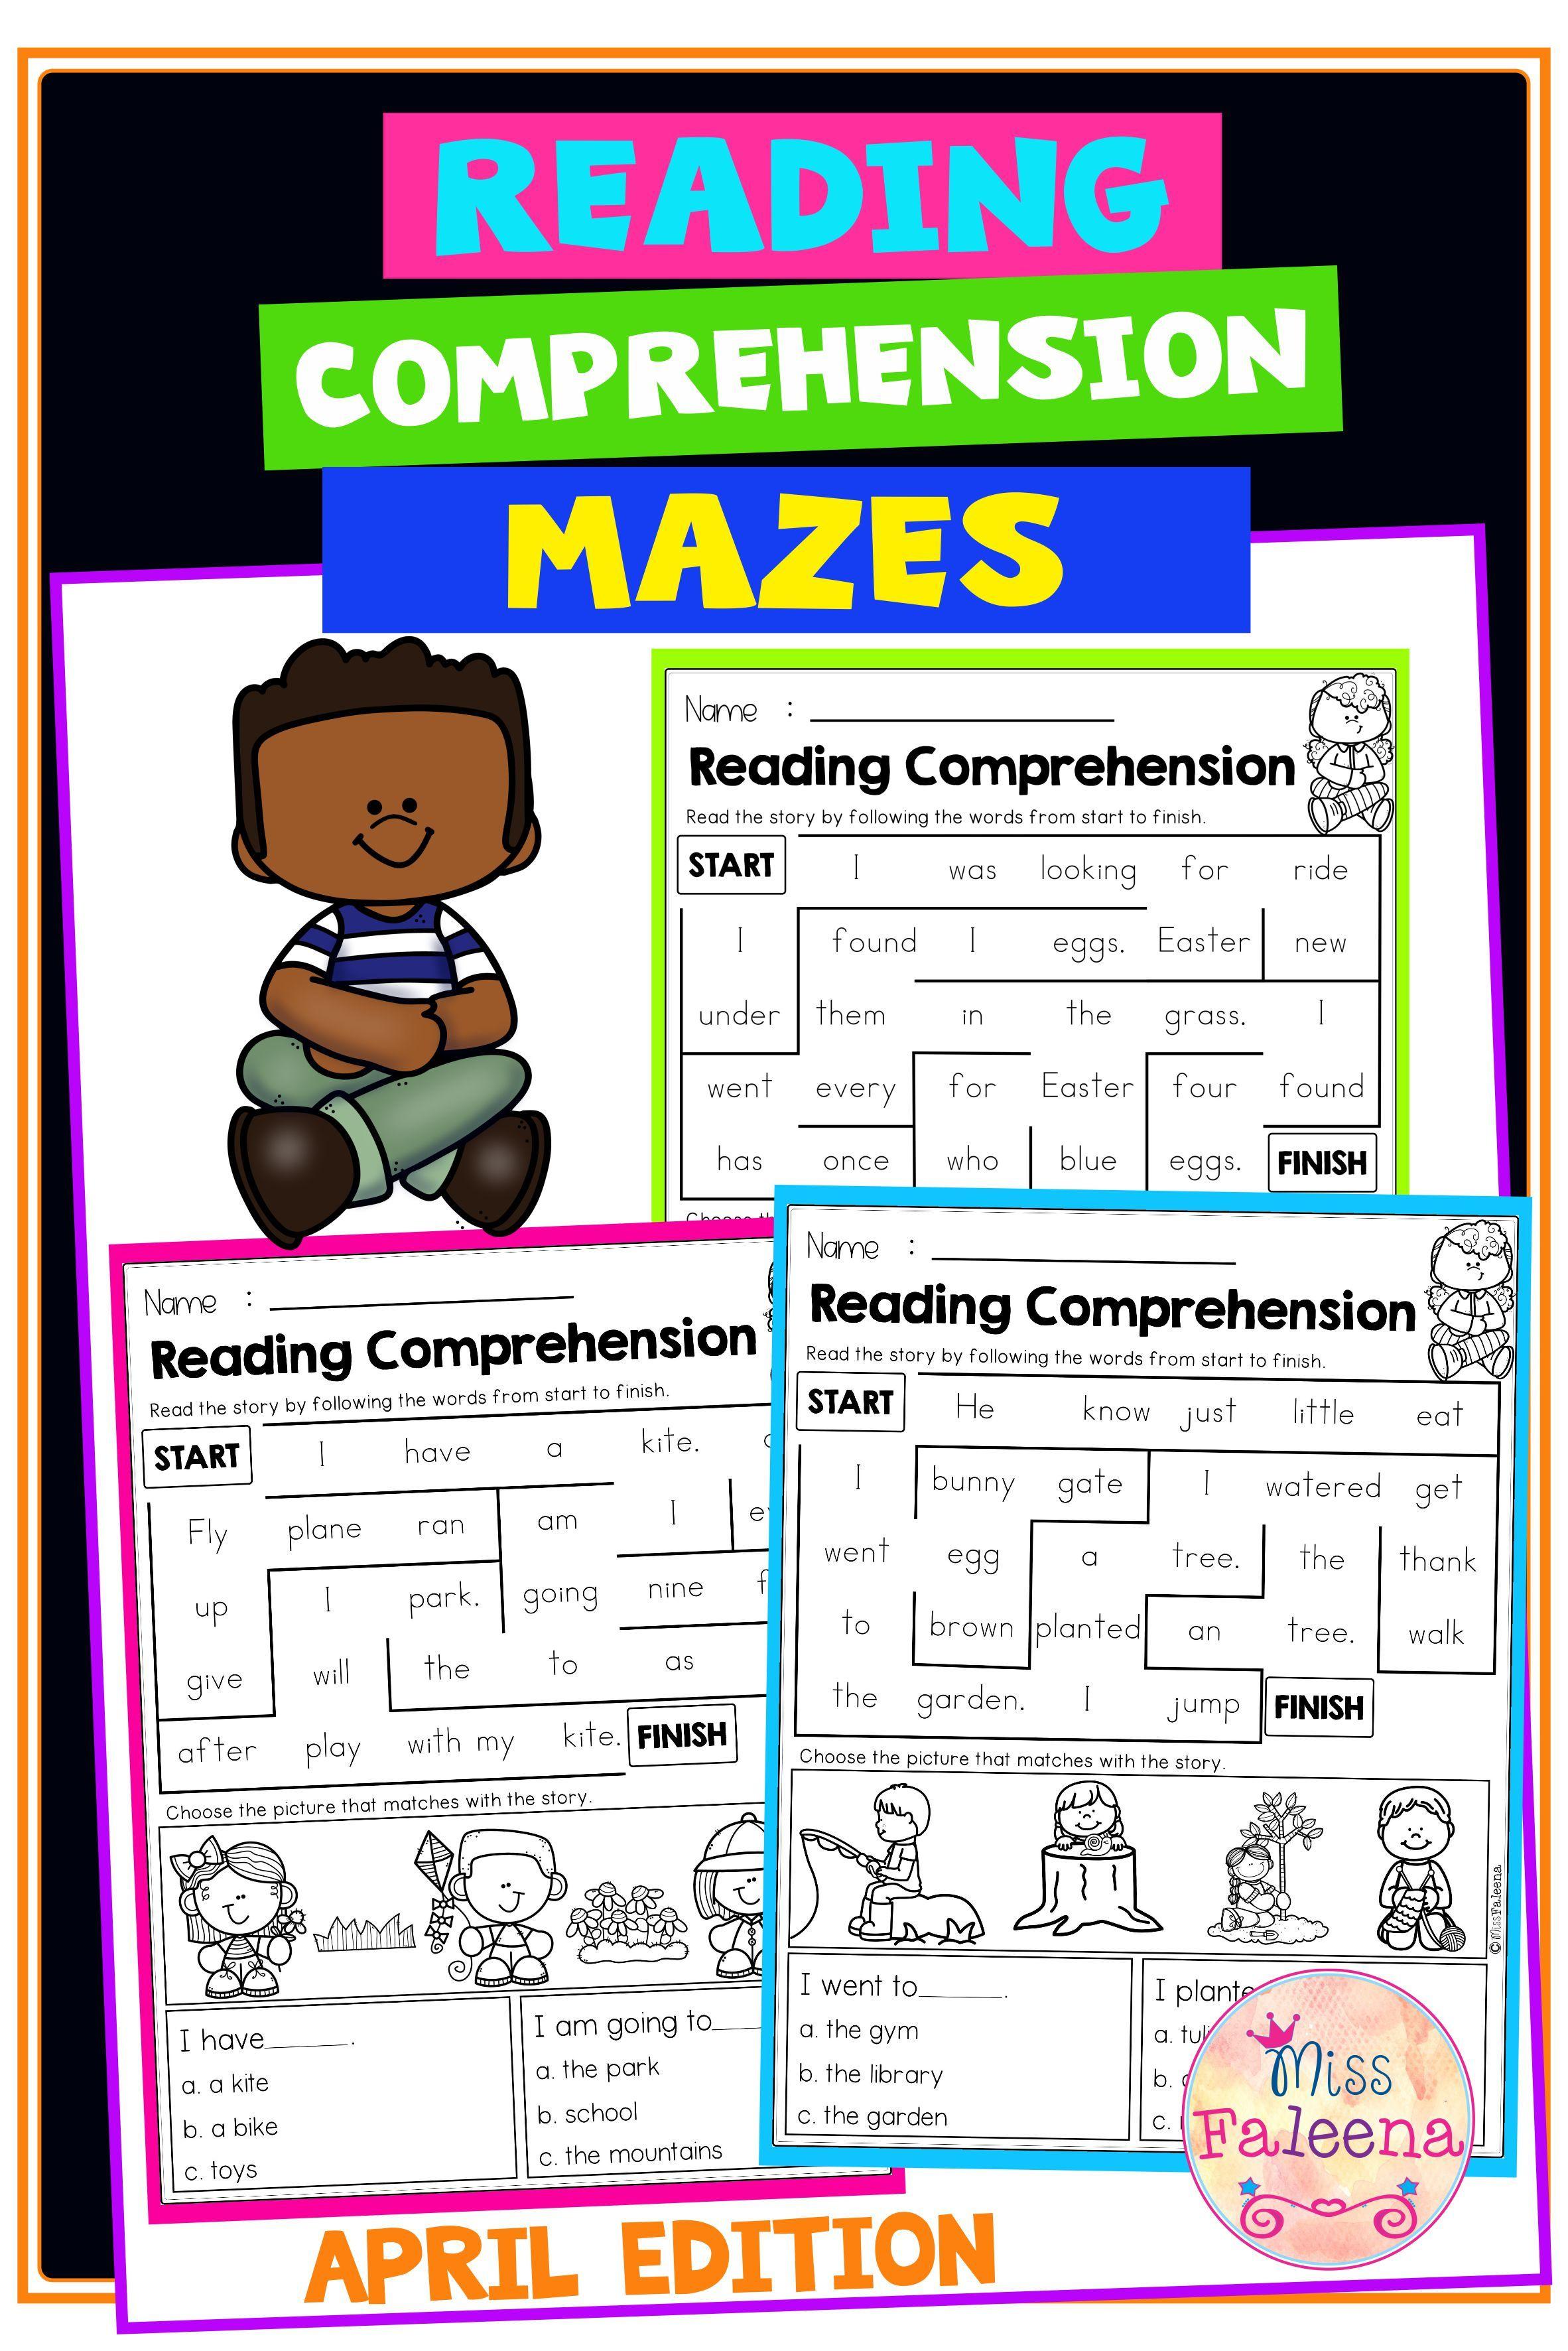 April Reading Comprehension Mazes In 2021 April Reading Comprehension Reading Comprehension April Reading [ 3544 x 2364 Pixel ]